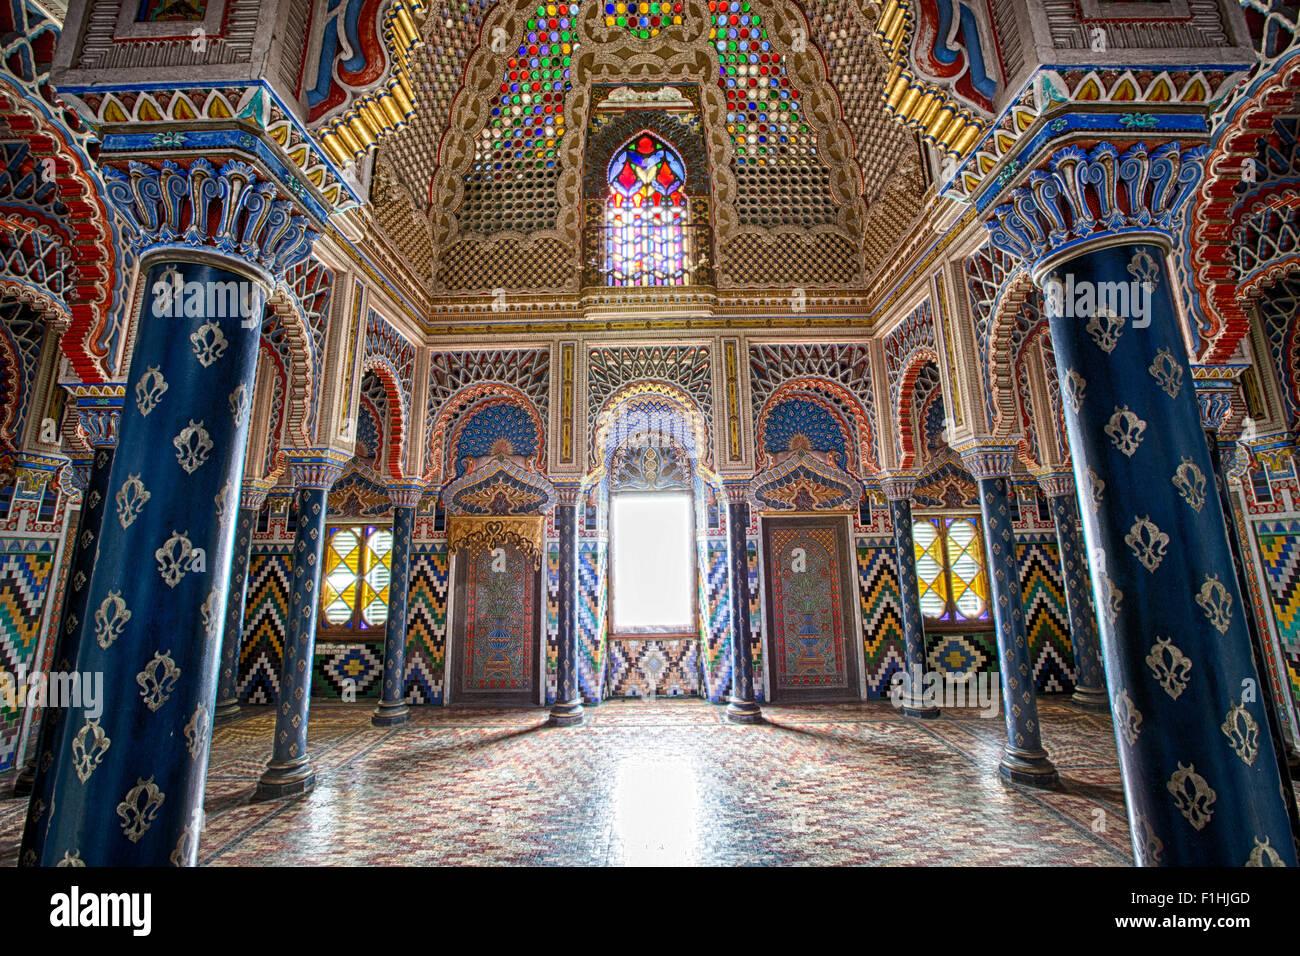 Moorish Style Palace Interior Arabian Fairy Tale Architecture Details